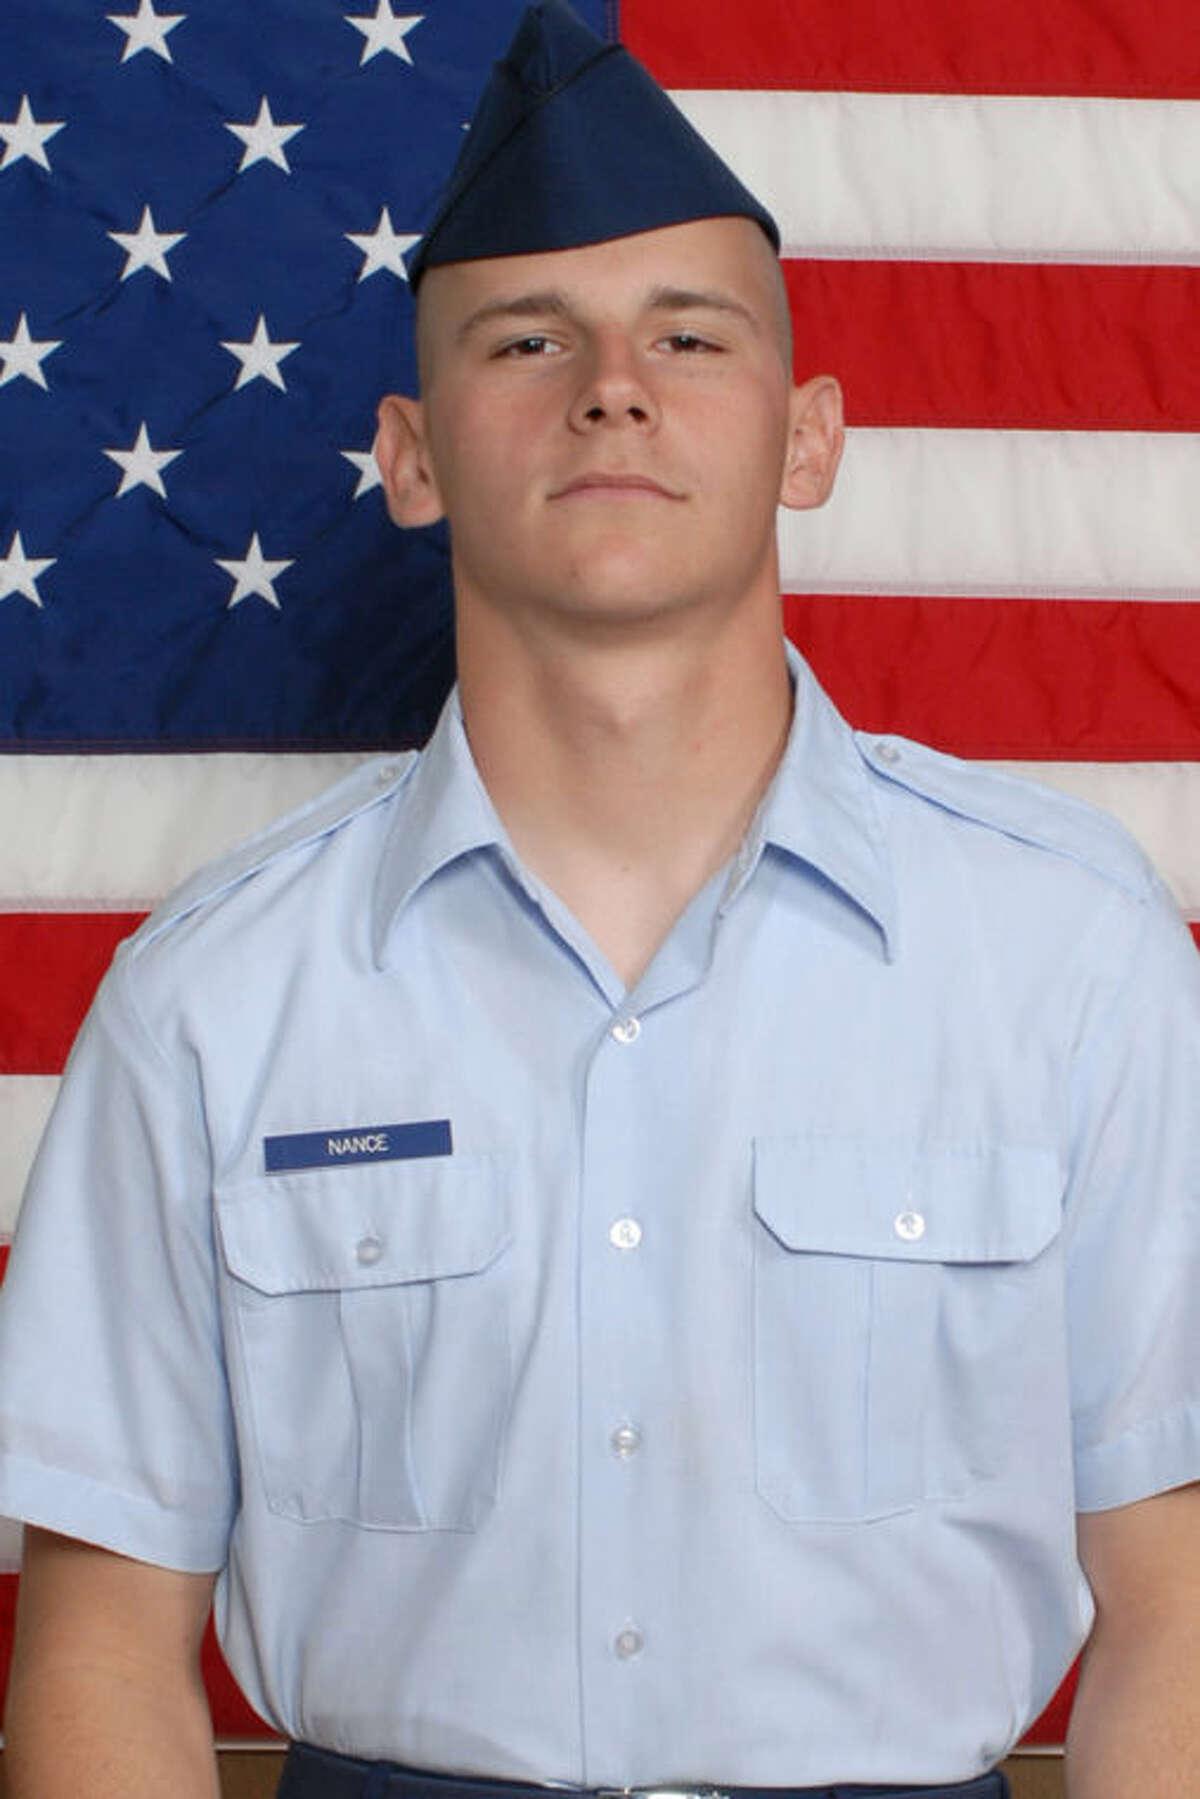 Air Force Airman Taylor J. Nance